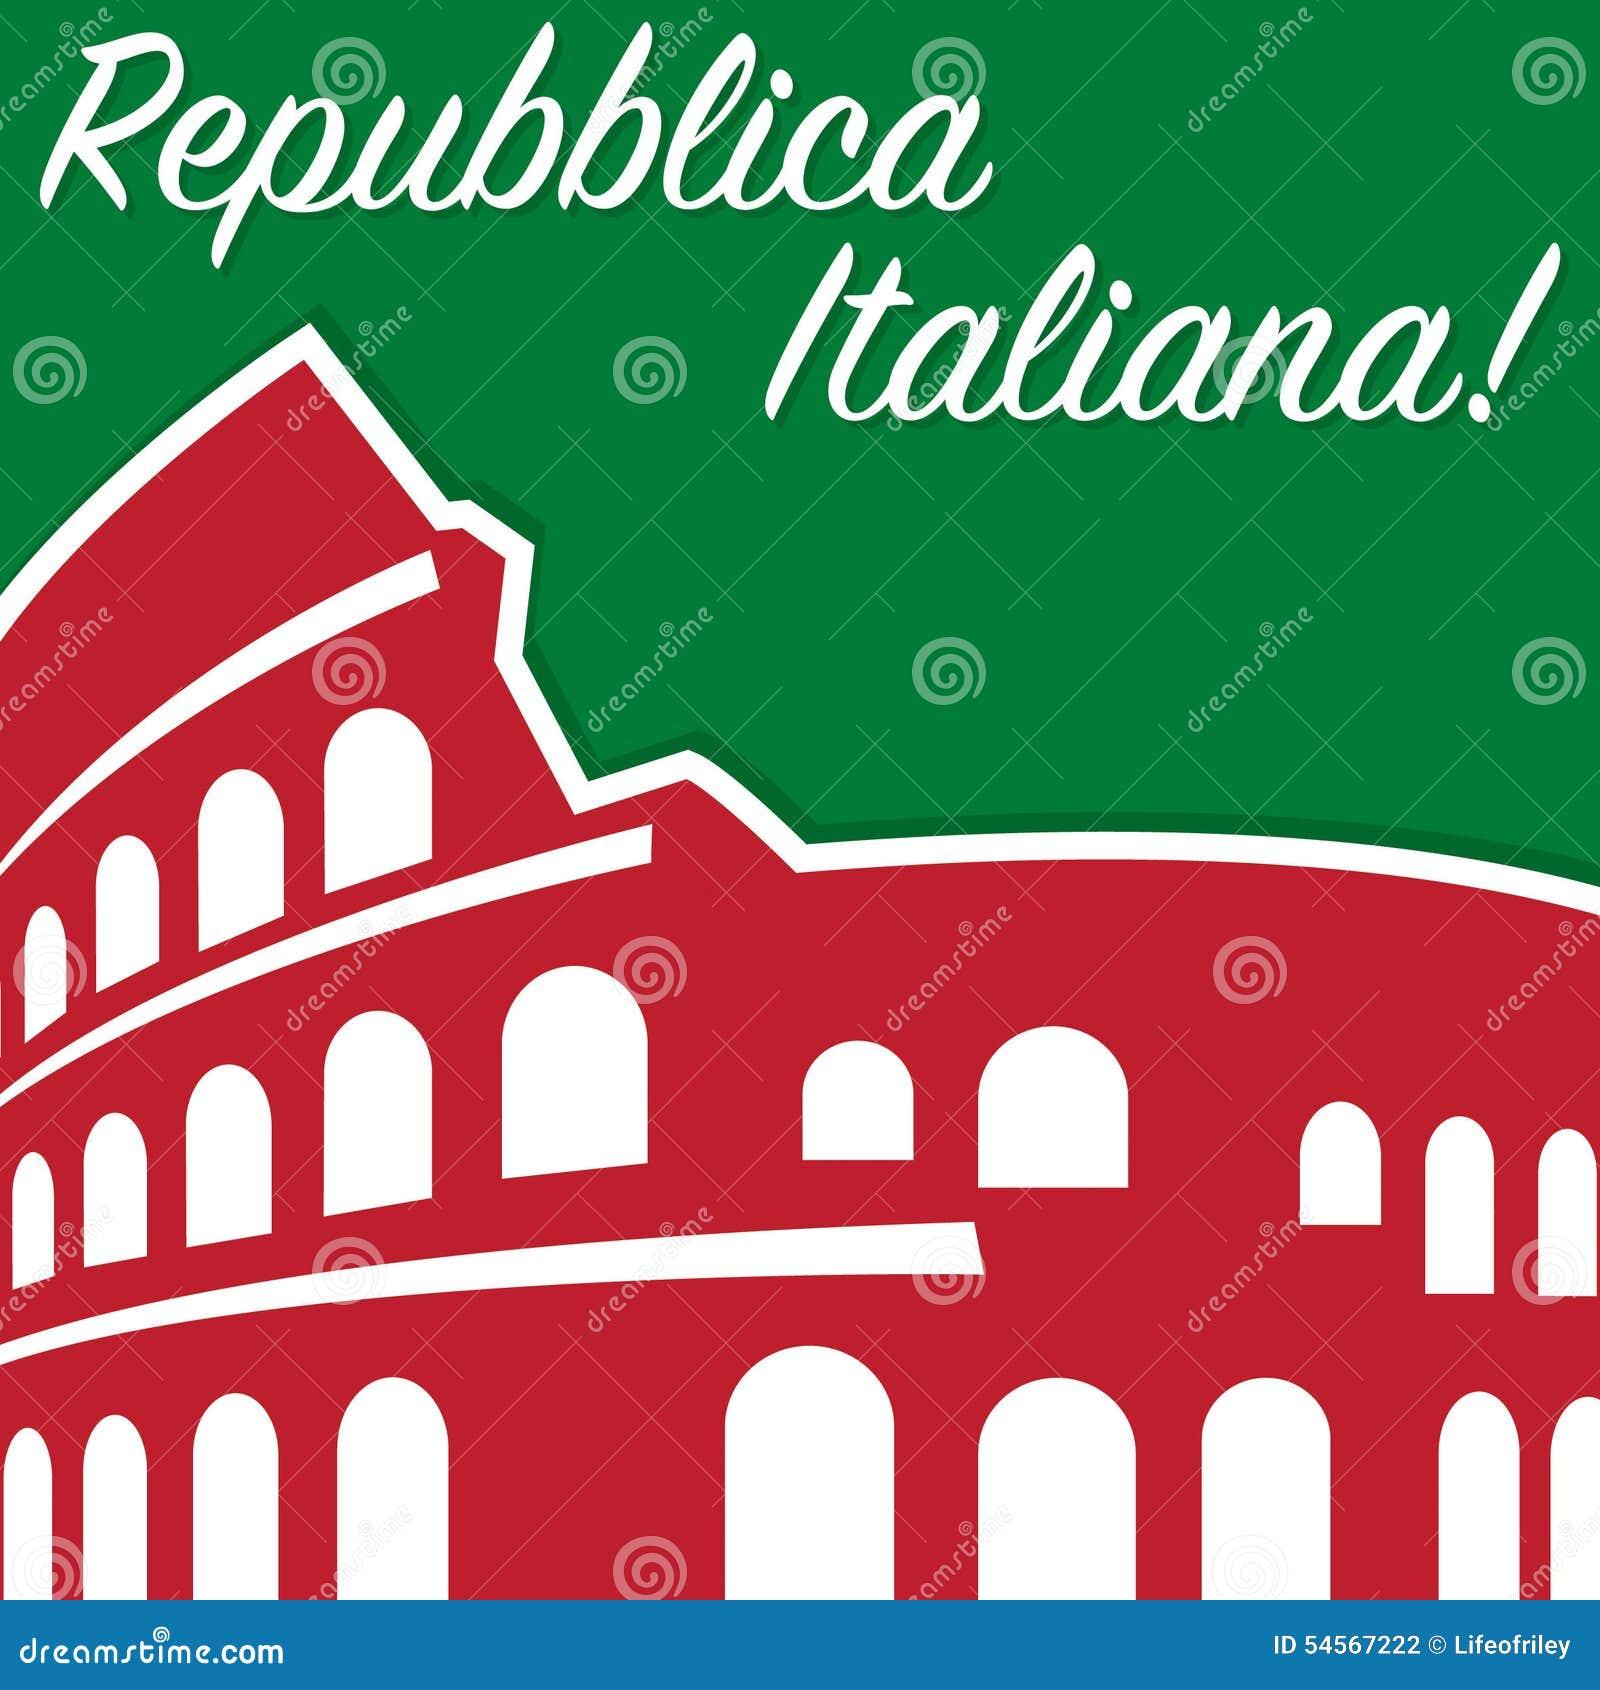 Italian Republic Day Stock Vector Illustration Of Invitation 54567222